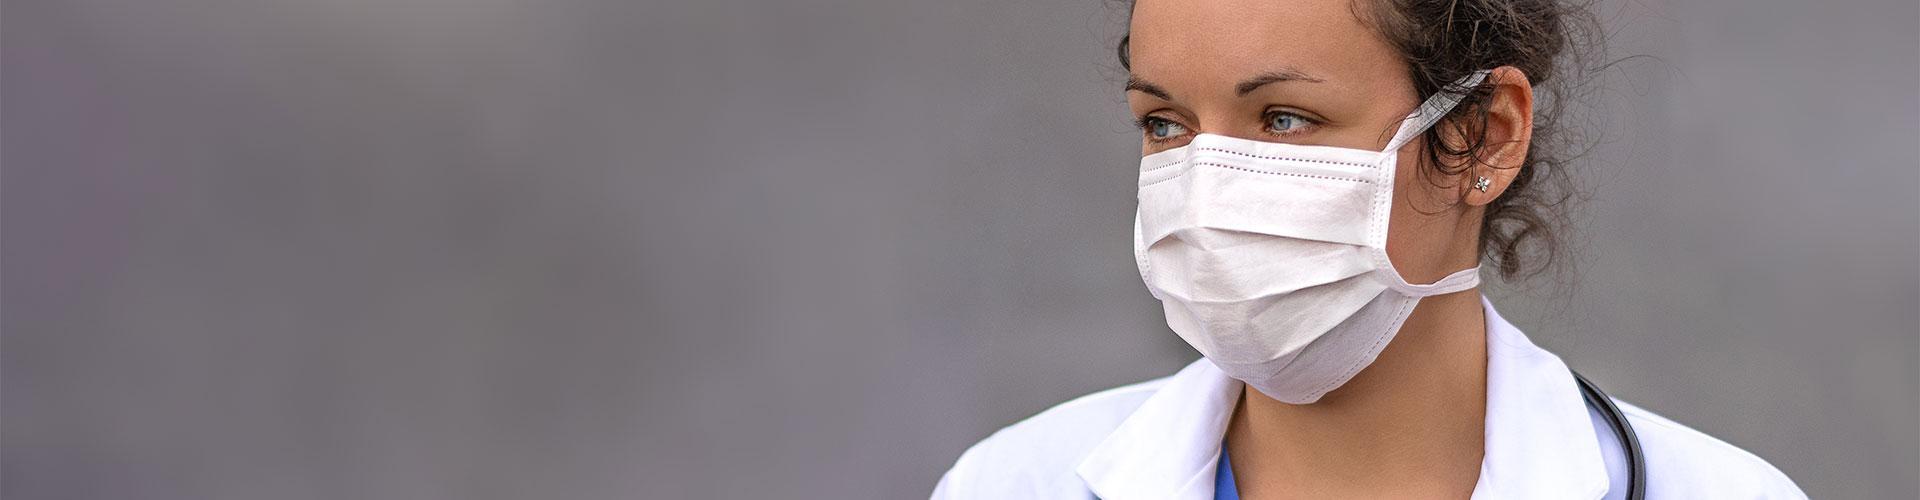 Female doctor in mask